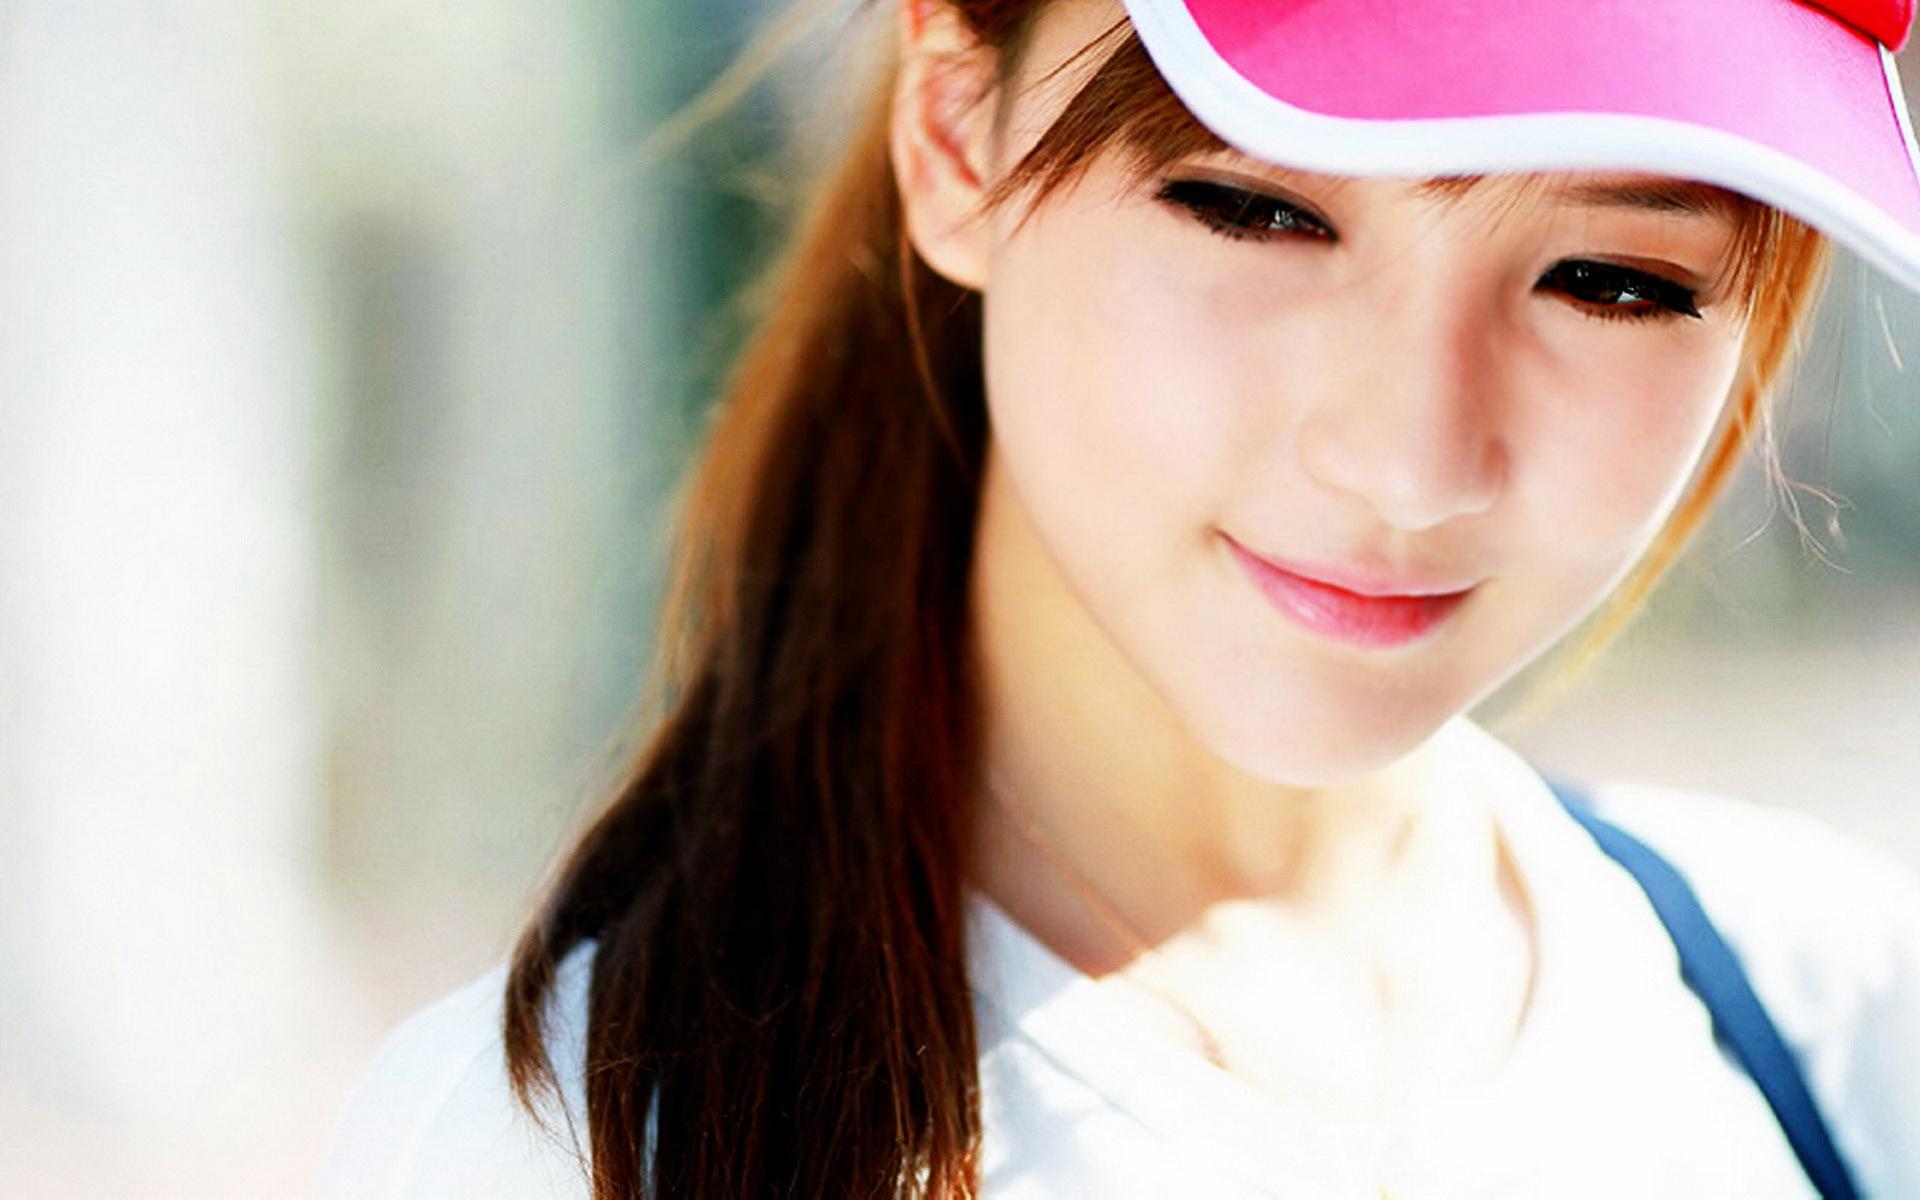 Japanese Girl HD Wallpapers